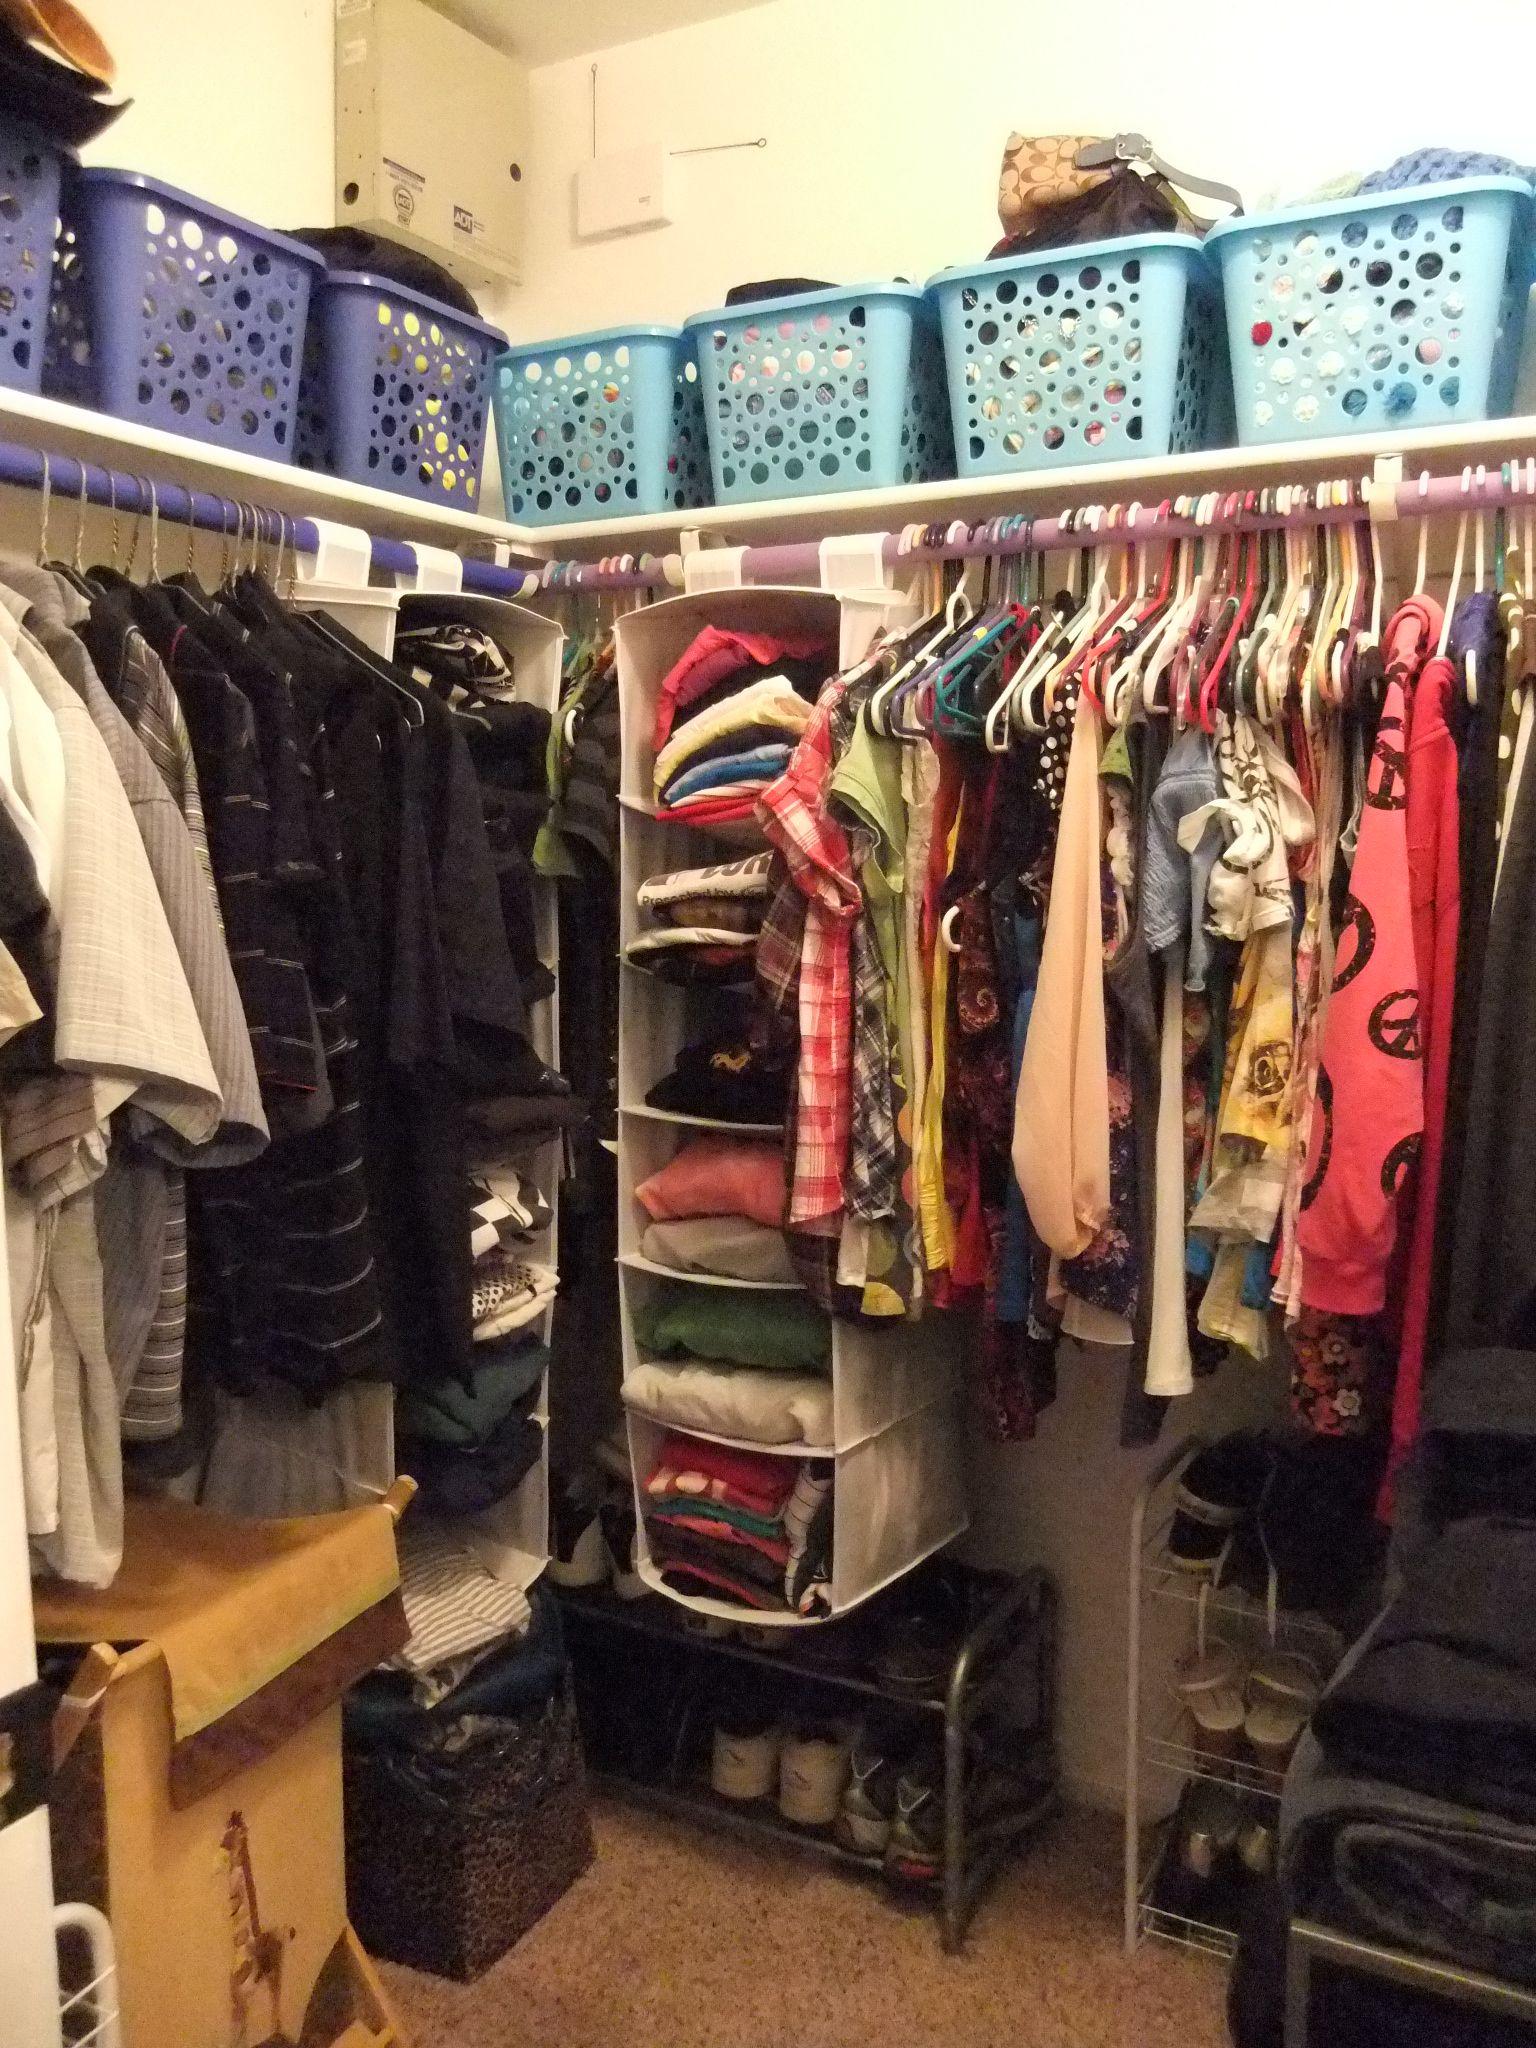 Apartment Closet Organization Ideas Clothes